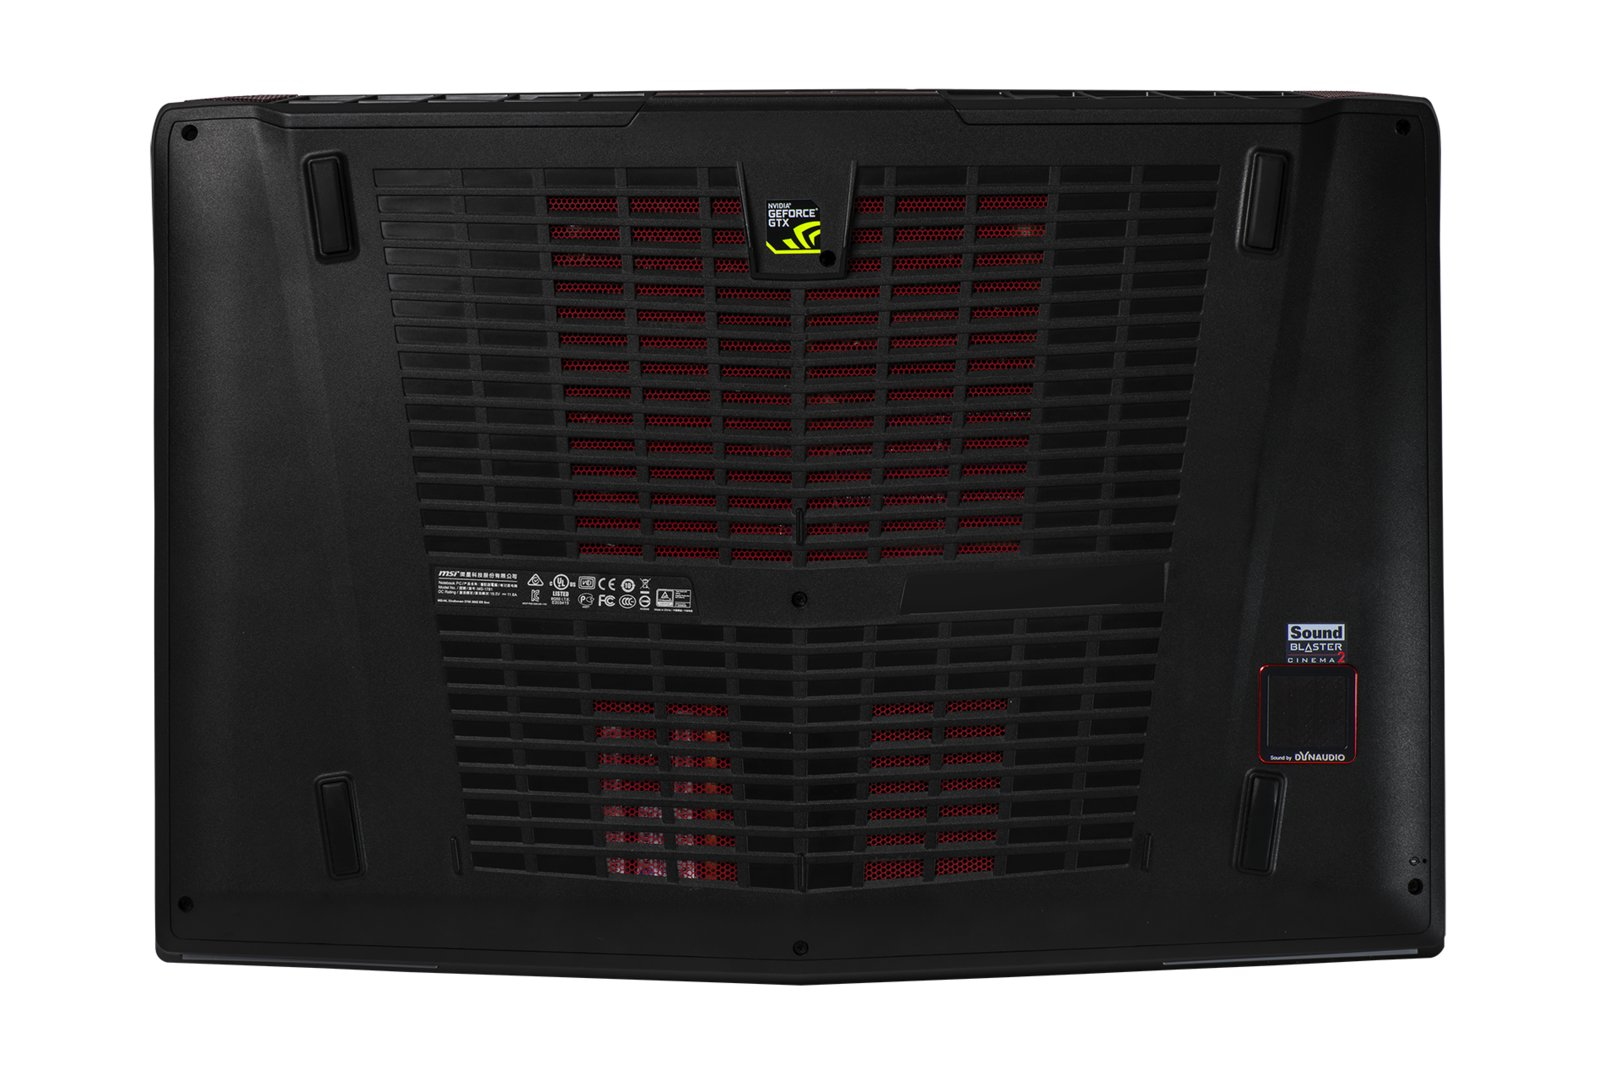 MSI GT72 2QE Dominator Pro mit GTX 980M